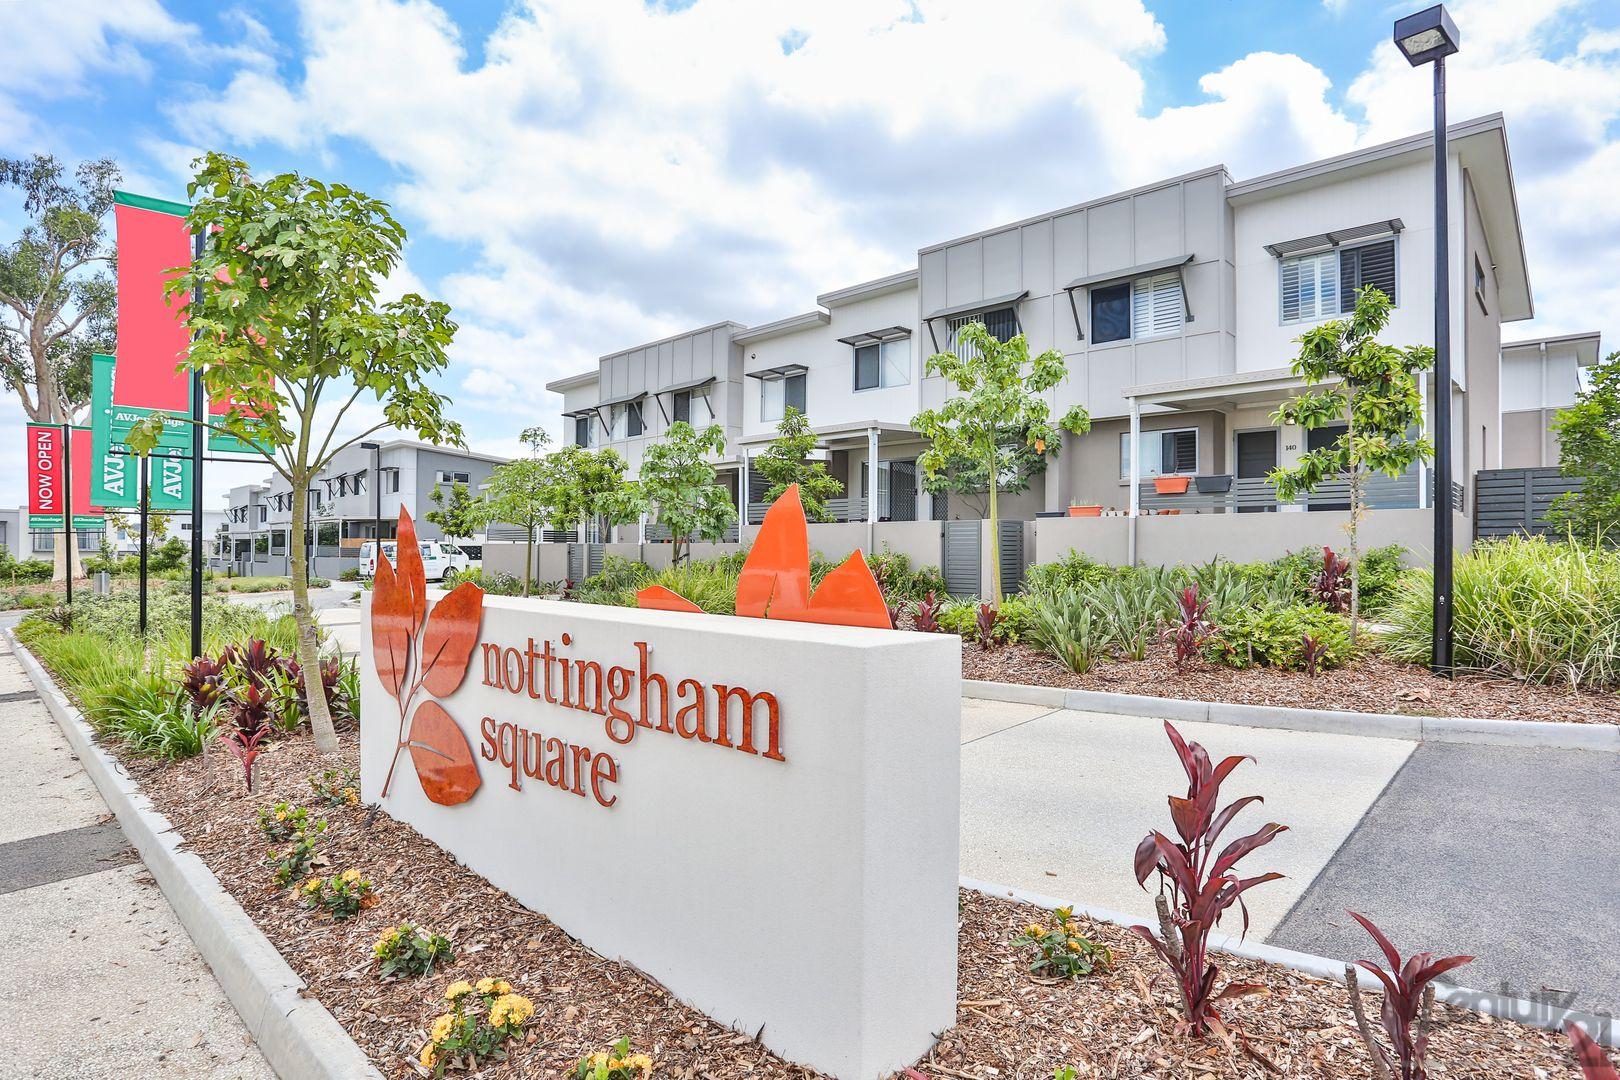 141/85 Nottingham Road, Calamvale QLD 4116, Image 1